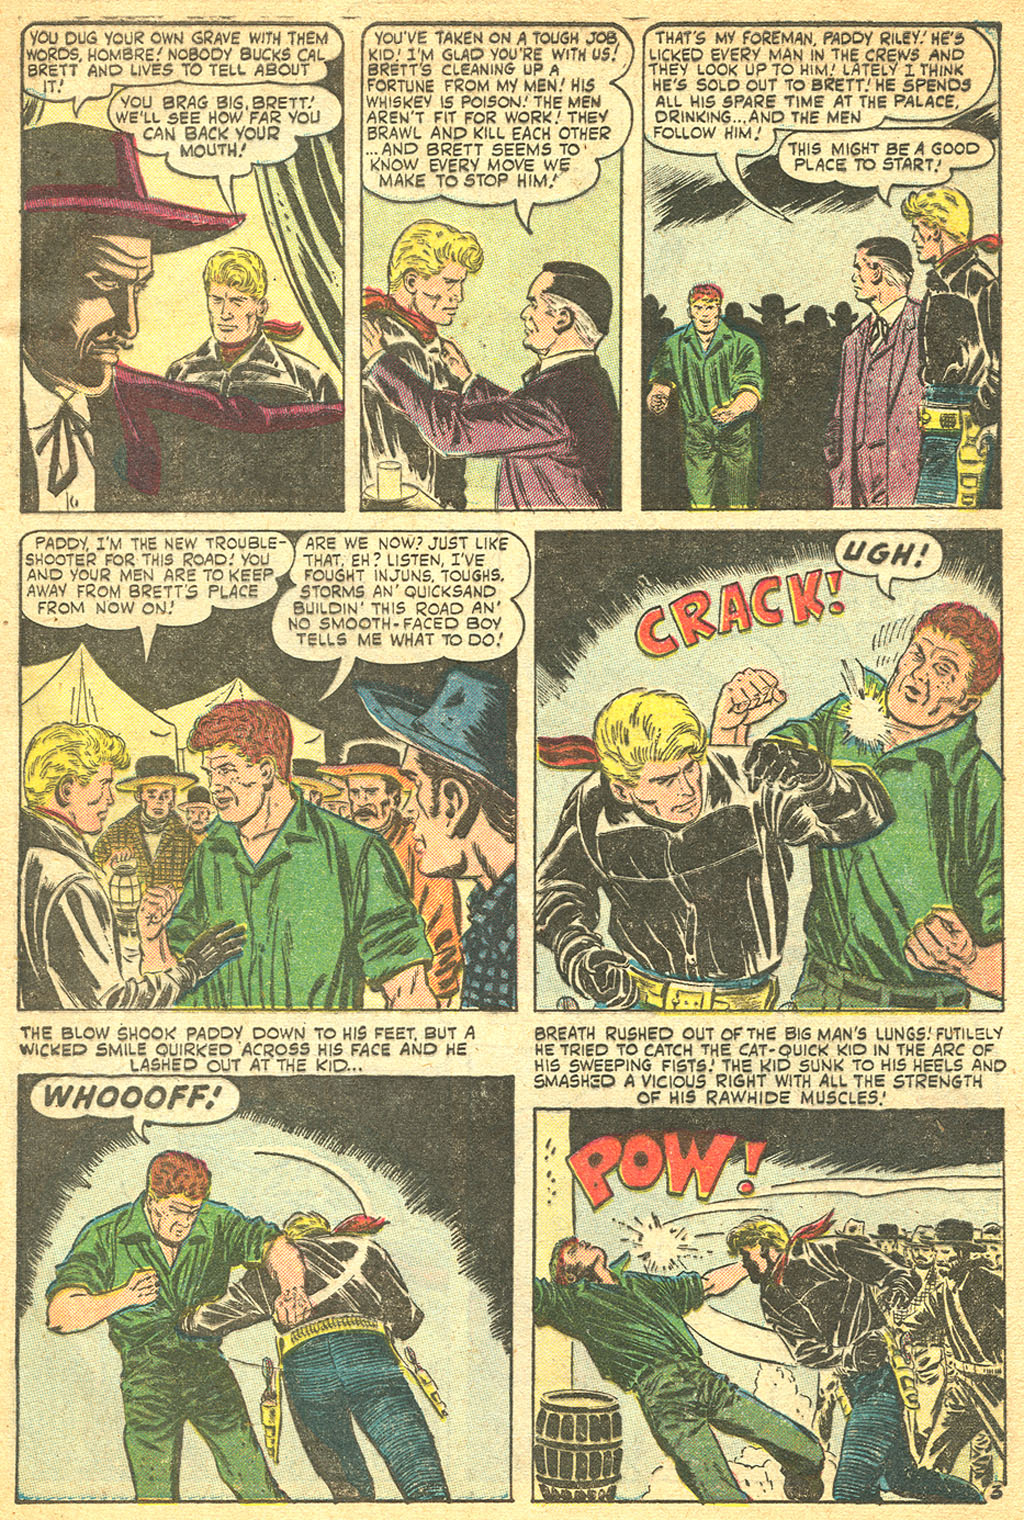 Read online Two-Gun Kid comic -  Issue #11 - 5